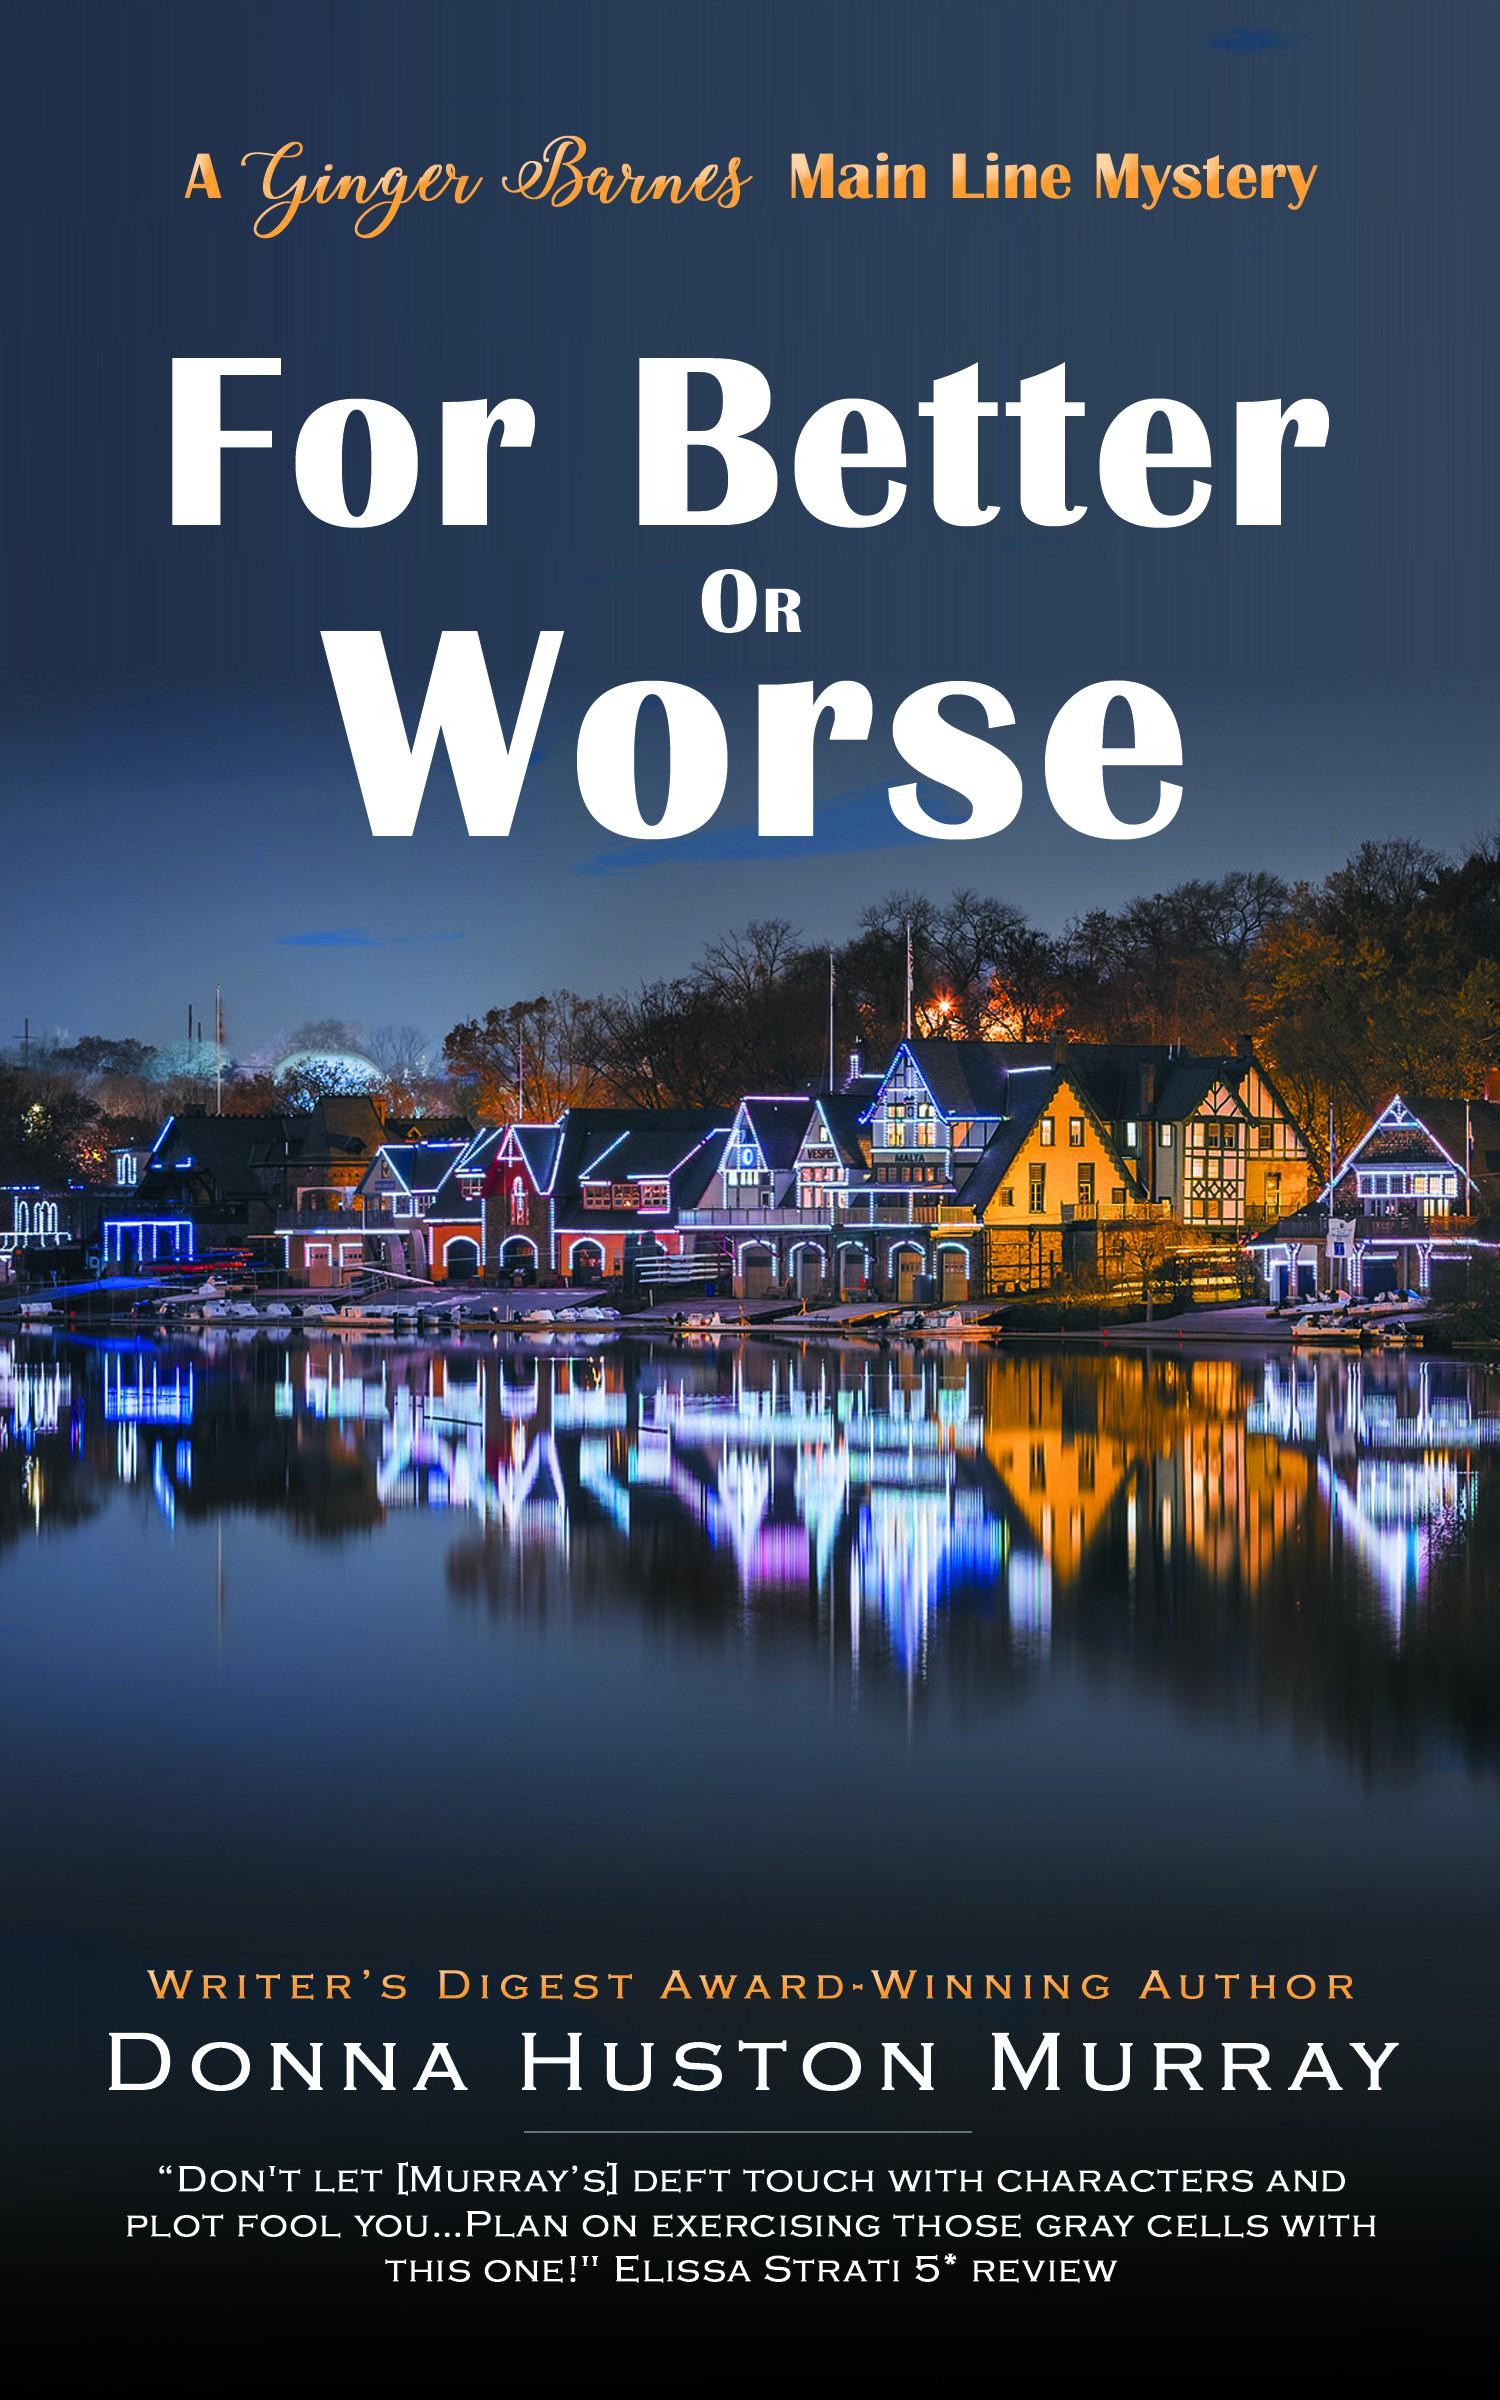 5* mystery novel needs a captivating cover